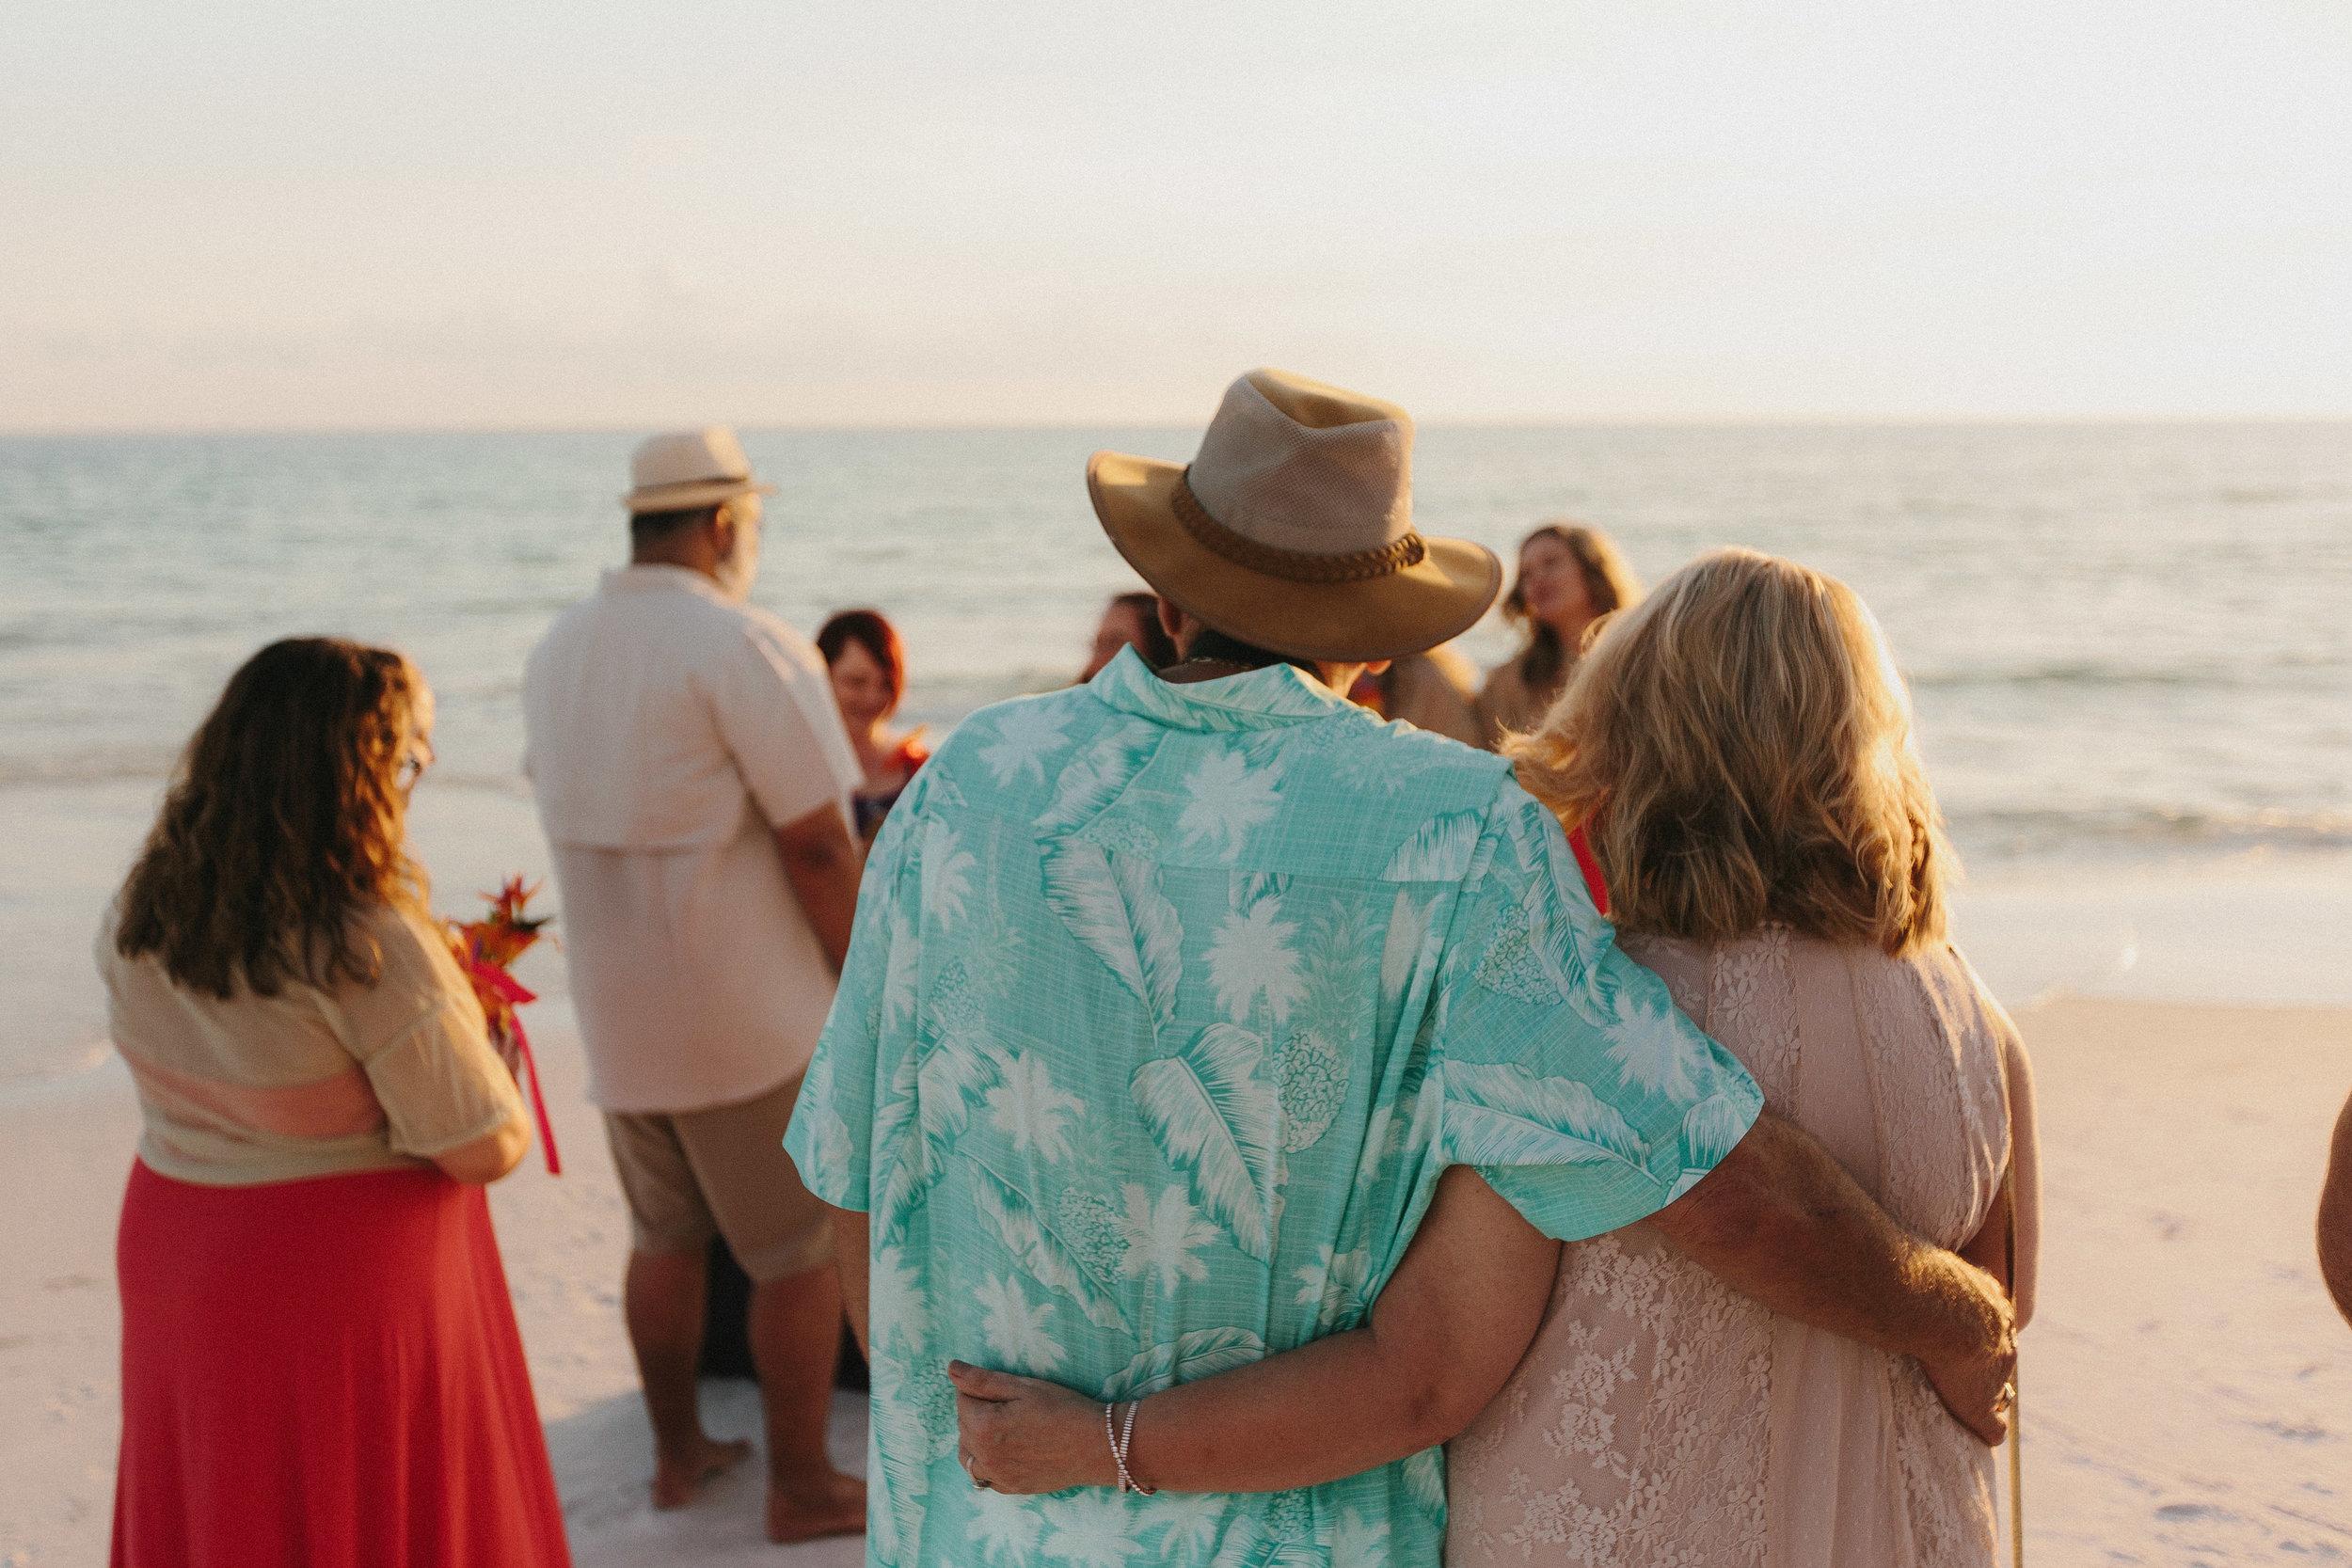 destin_sunset_beach_elopement_intimate_wedding_photographer_florida_documentary_1181.jpg